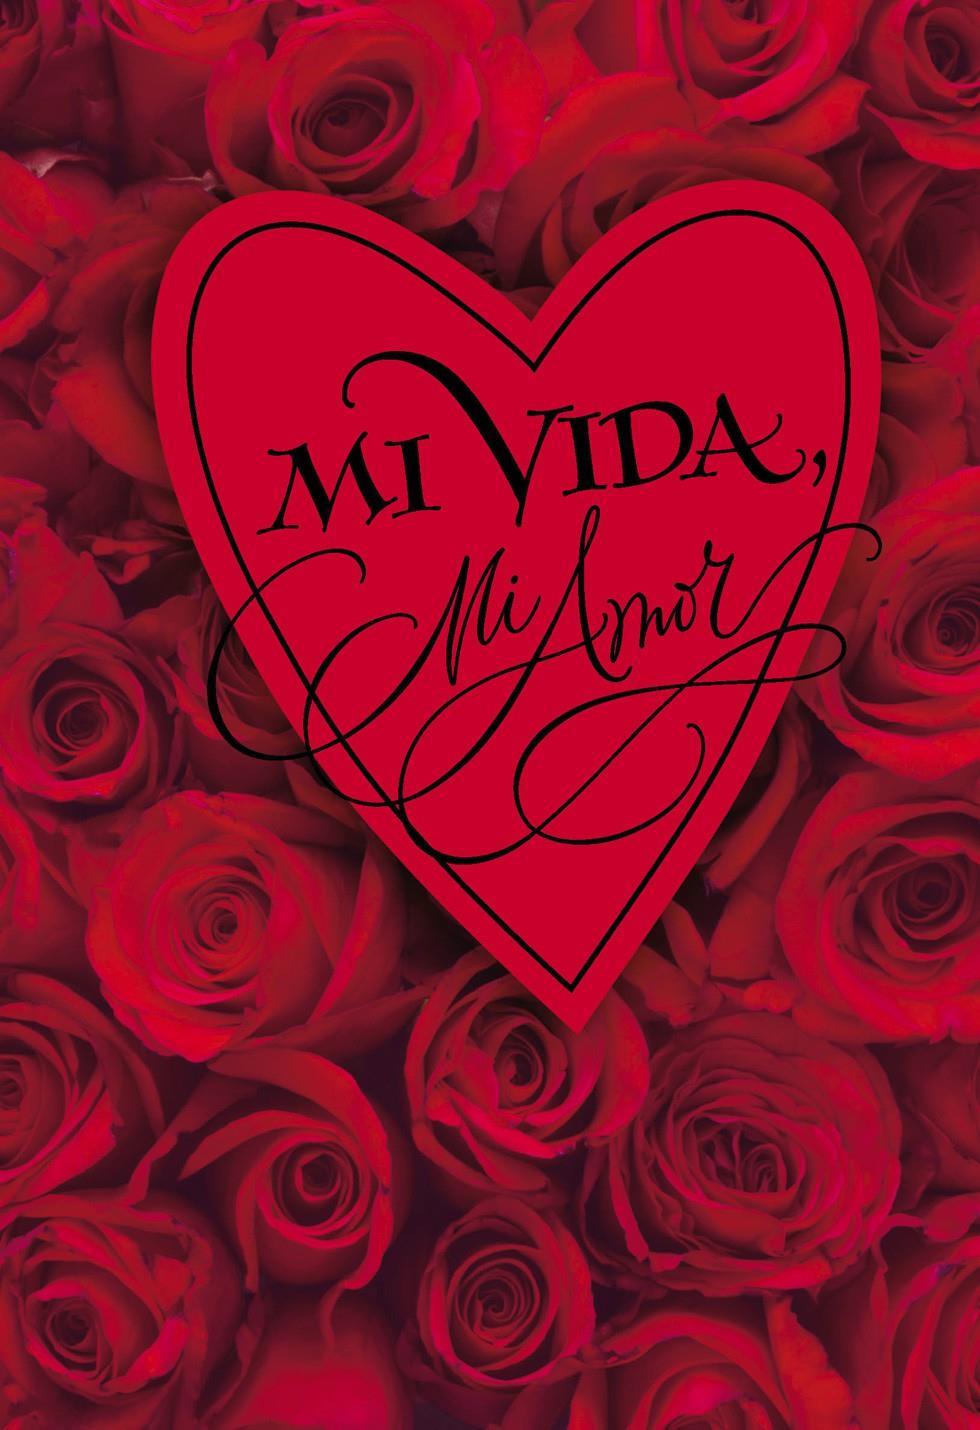 My life my love spanish valentines day card greeting cards hallmark my life my love spanish valentines day card m4hsunfo